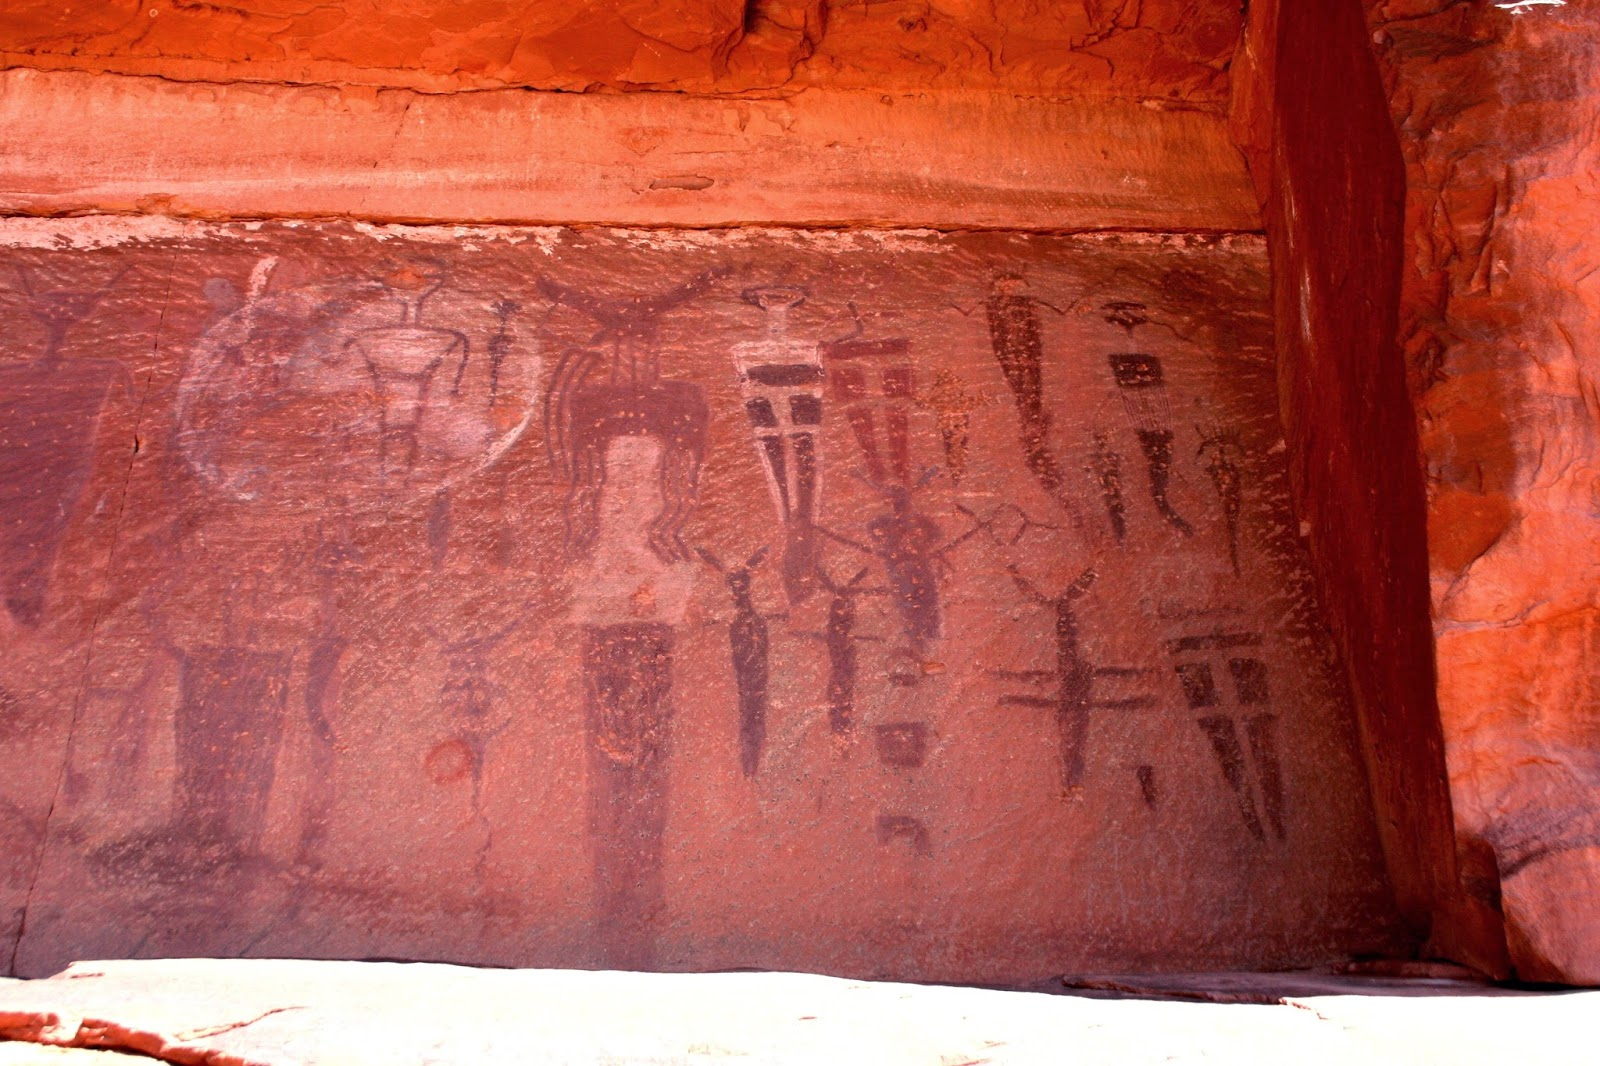 Utah Pictographs Petroglyphs And Rock Art April 2014